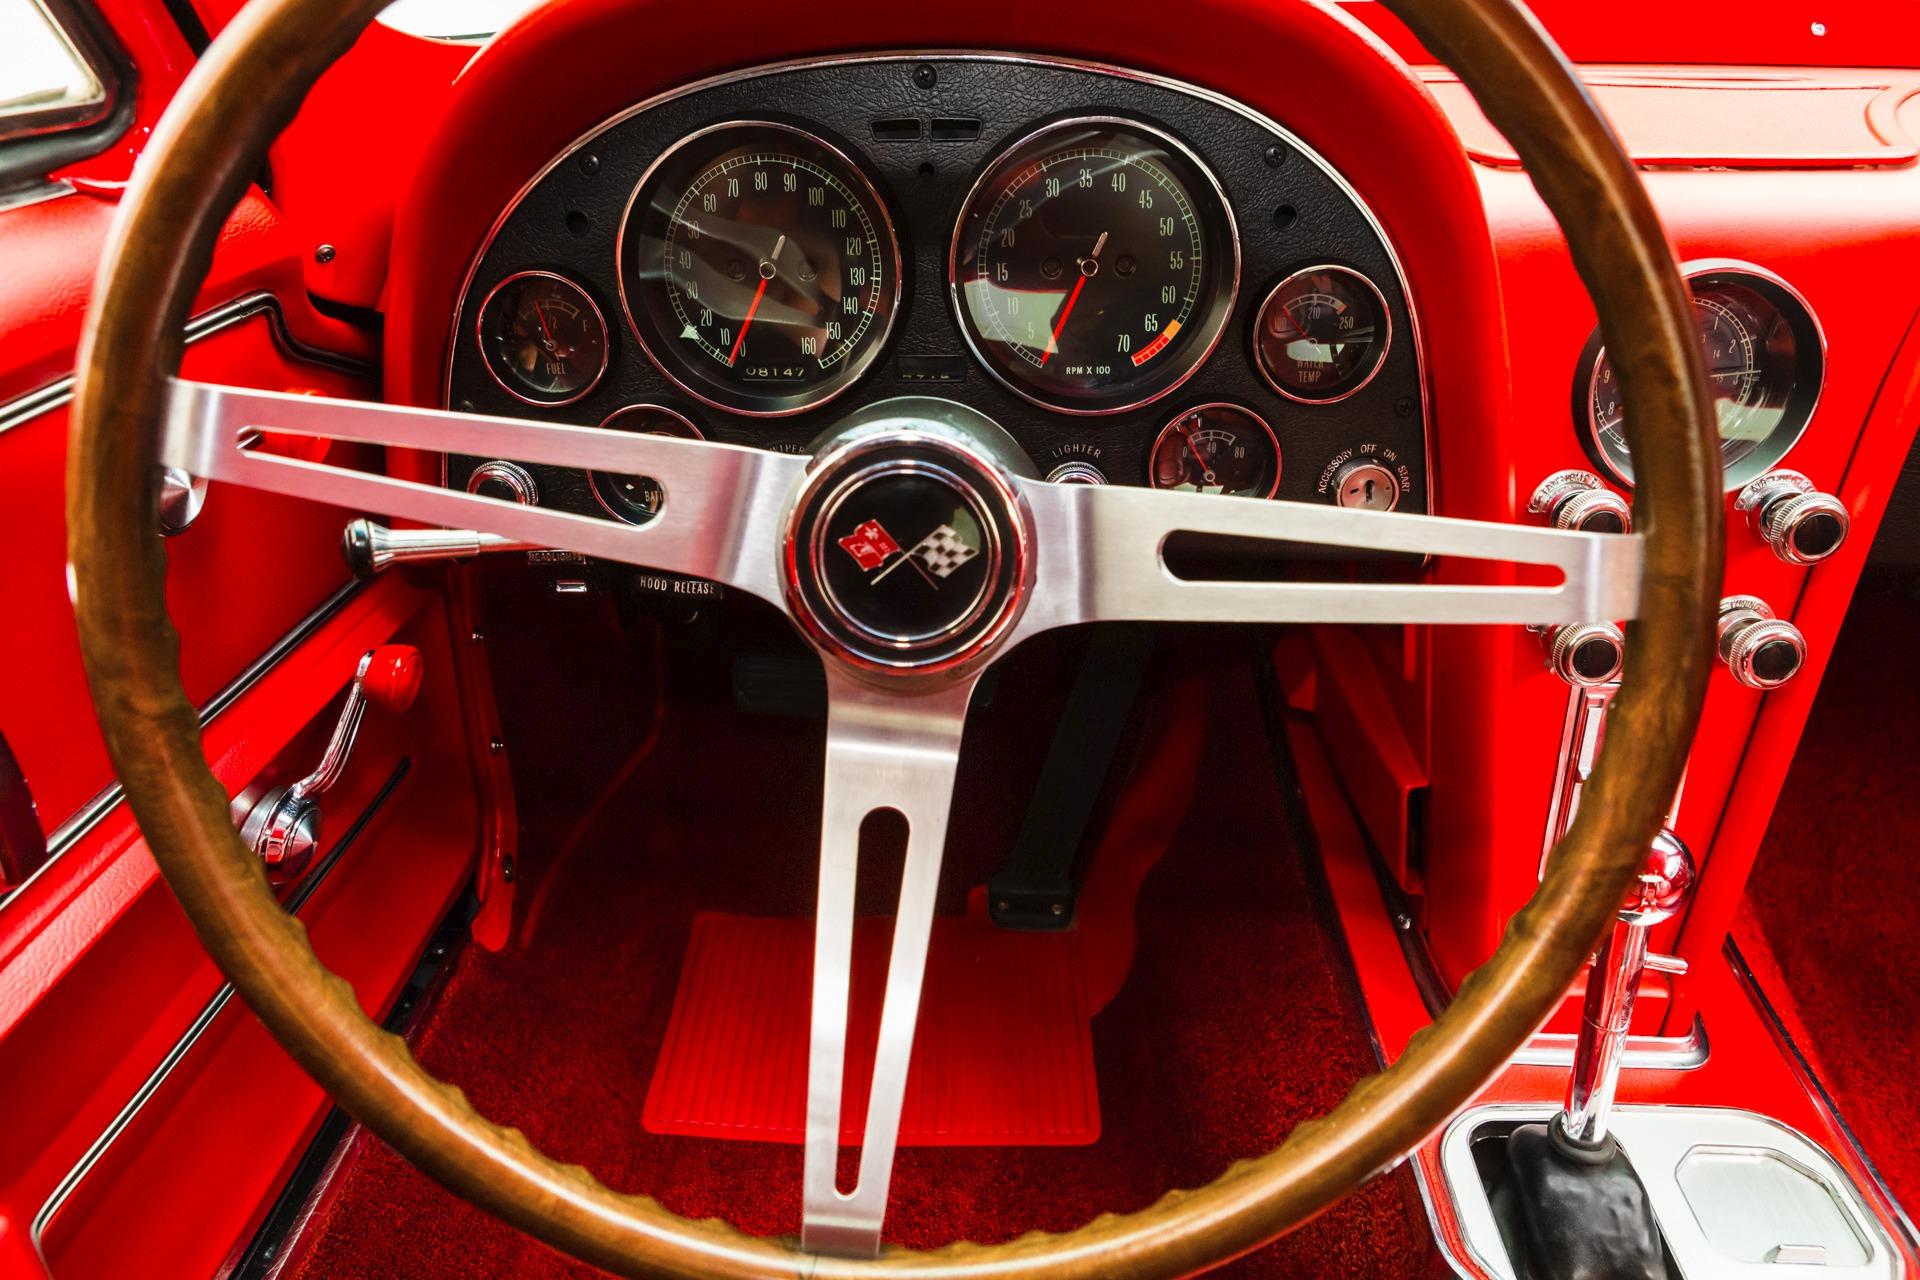 a 1967 Chevrolet Corvette